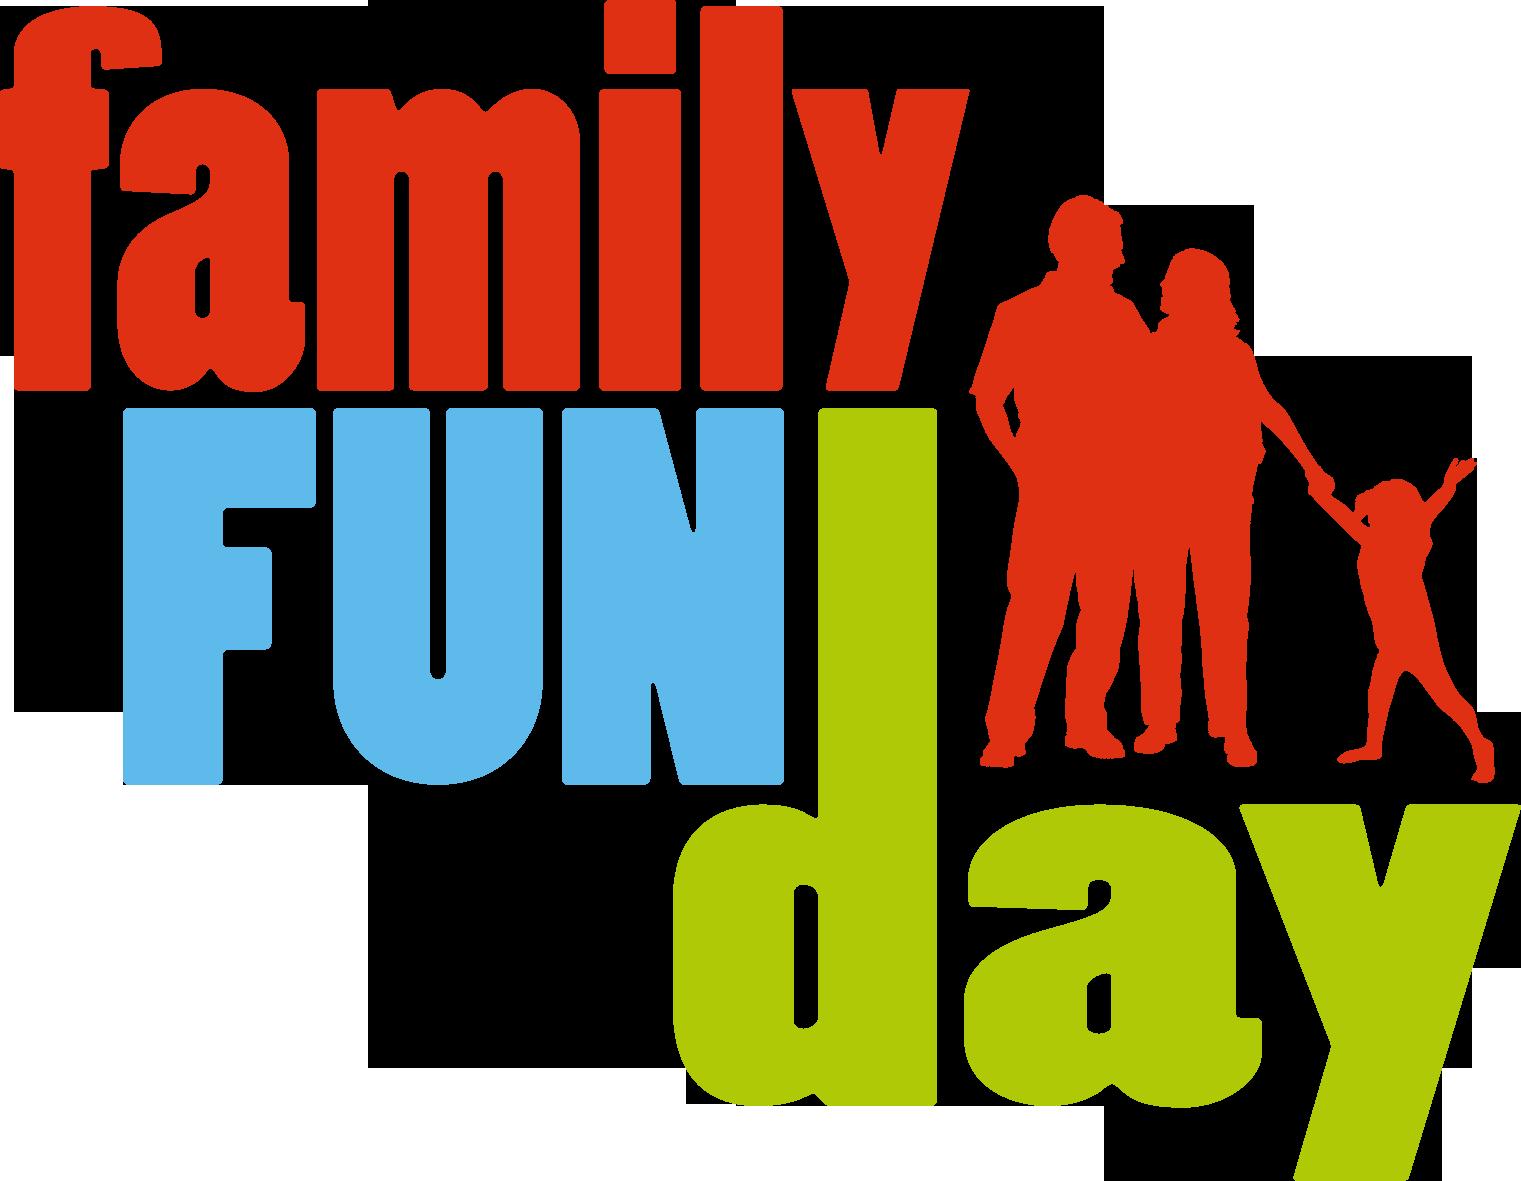 Festival clipart fun day Free Day Free Design Day